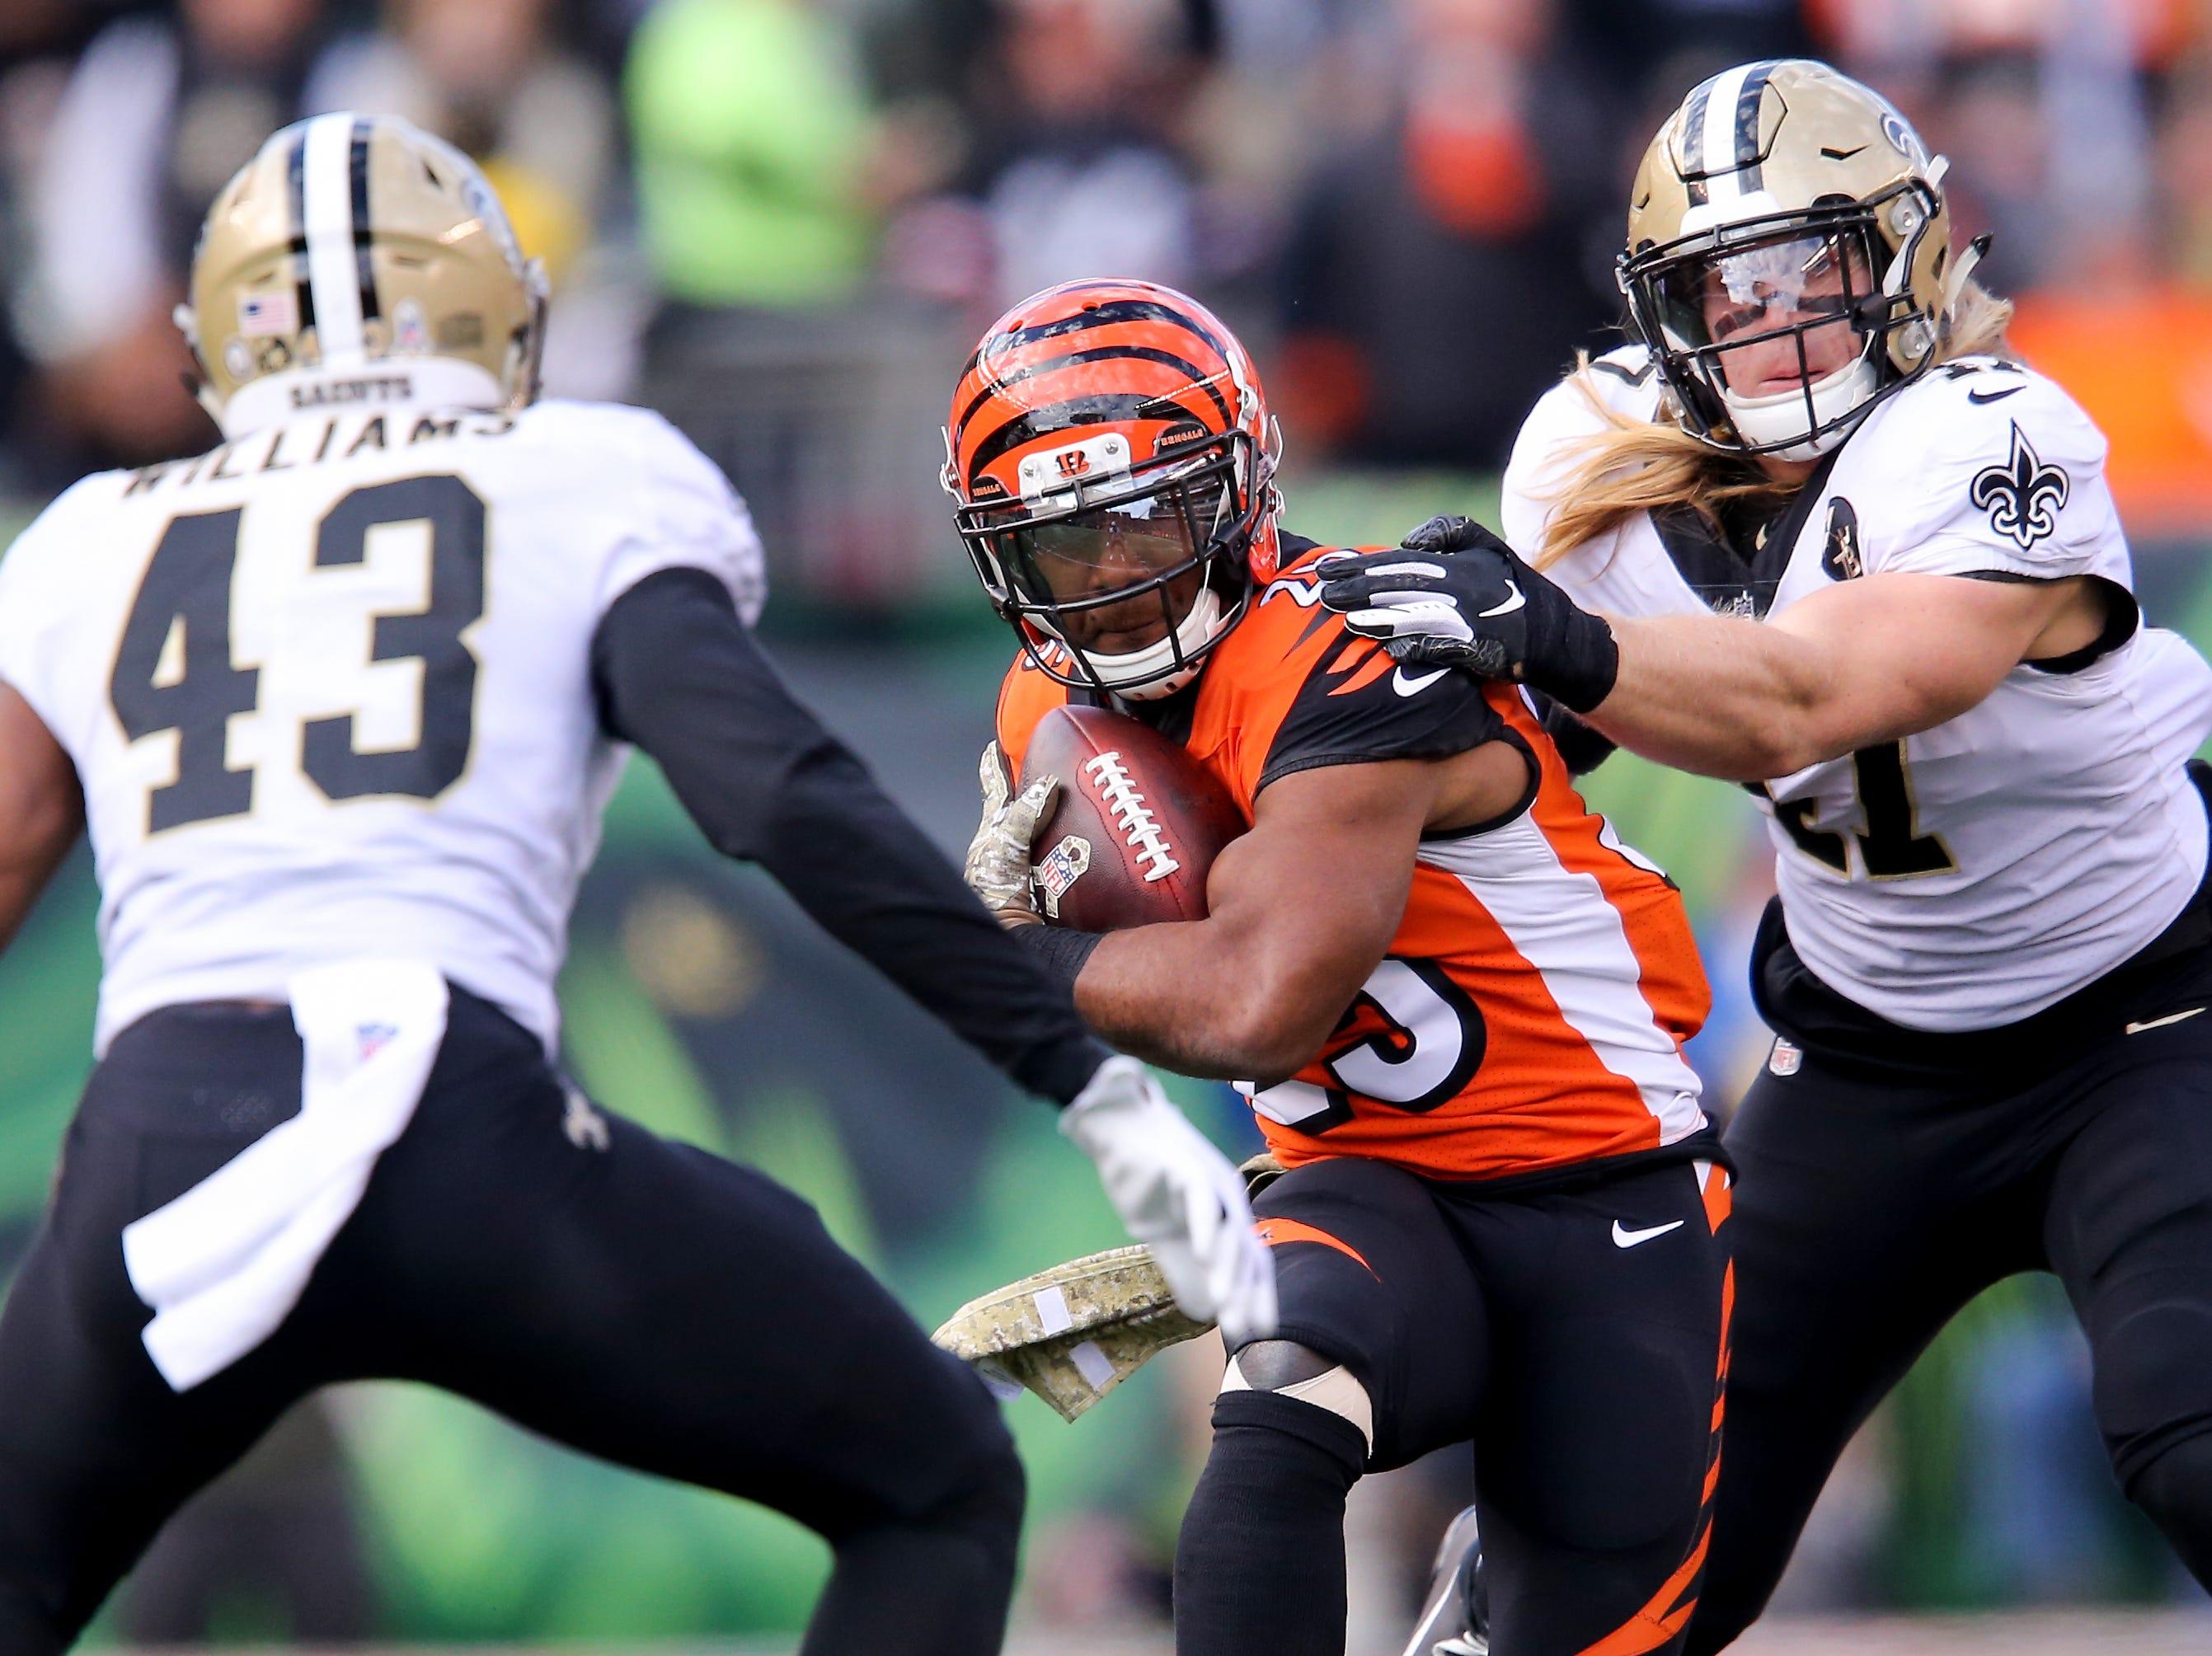 Cincinnati Bengals running back Giovani Bernard (25) carries the ball in the second quarter of a Week 10 NFL game between the New Orleans Saints and the Cincinnati Bengals, Sunday, Nov. 11, 2018, at Paul Brown Stadium in Cincinnati.